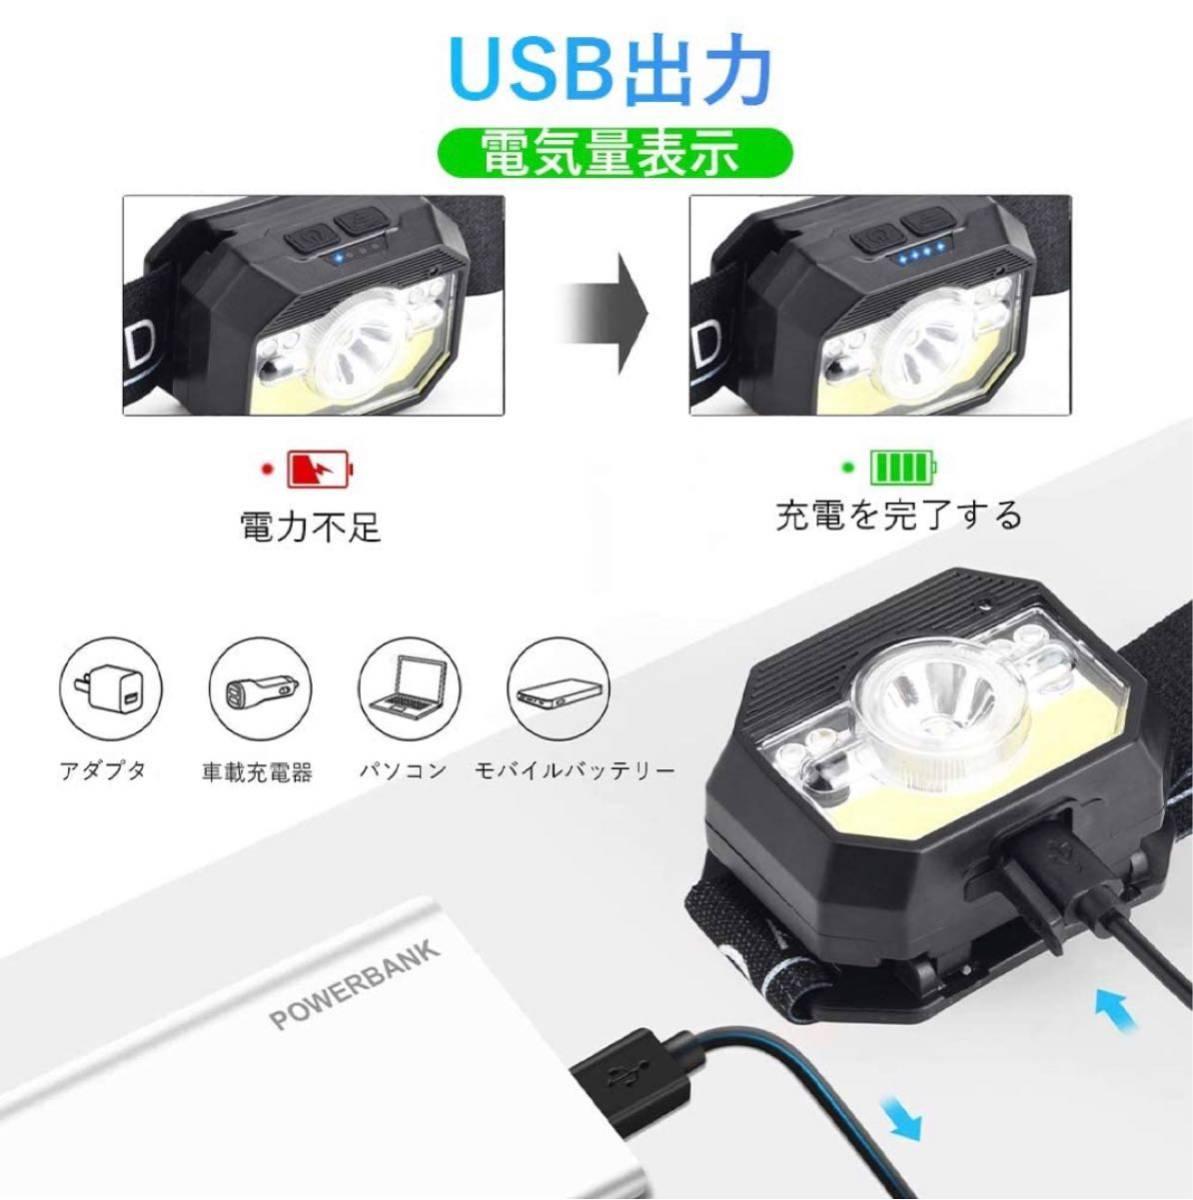 LEDヘッドライト 充電式 USB へっとライト 白&青&赤色サブ LEDライト 高輝度 明るい ヘッドランプ センサー機能付き